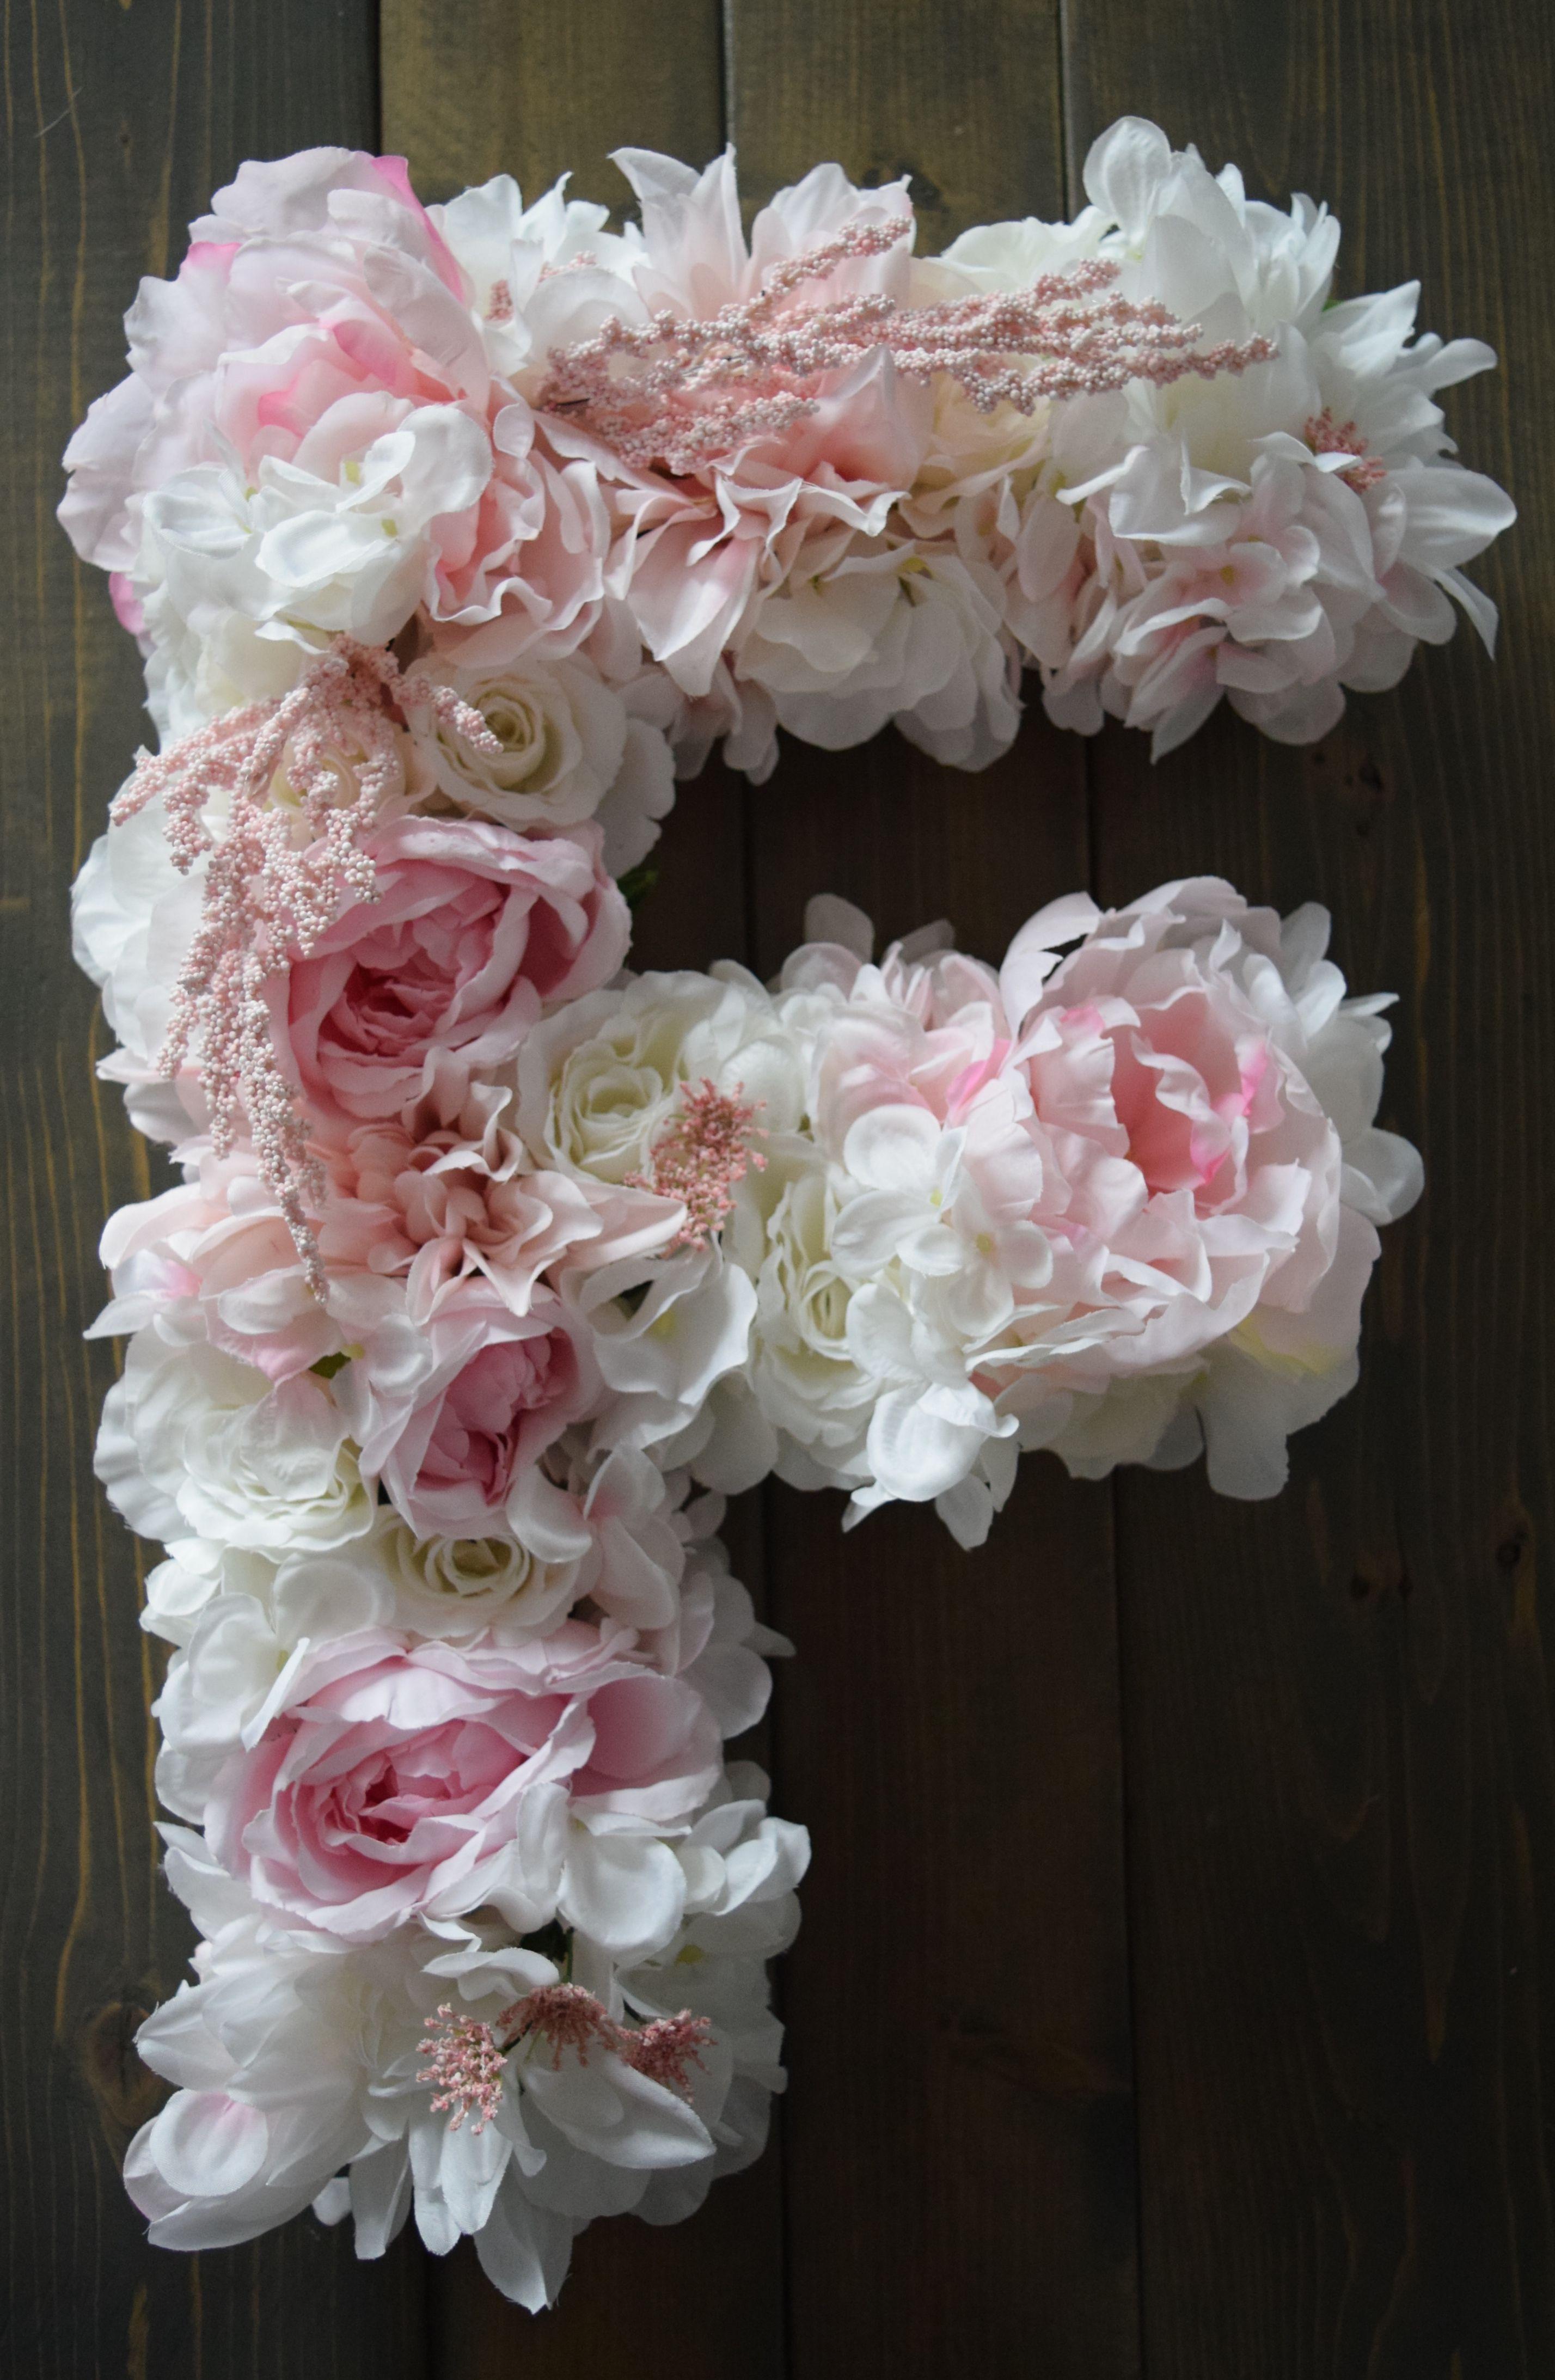 large flower letter large flower letter diy large flower letters initials large flower